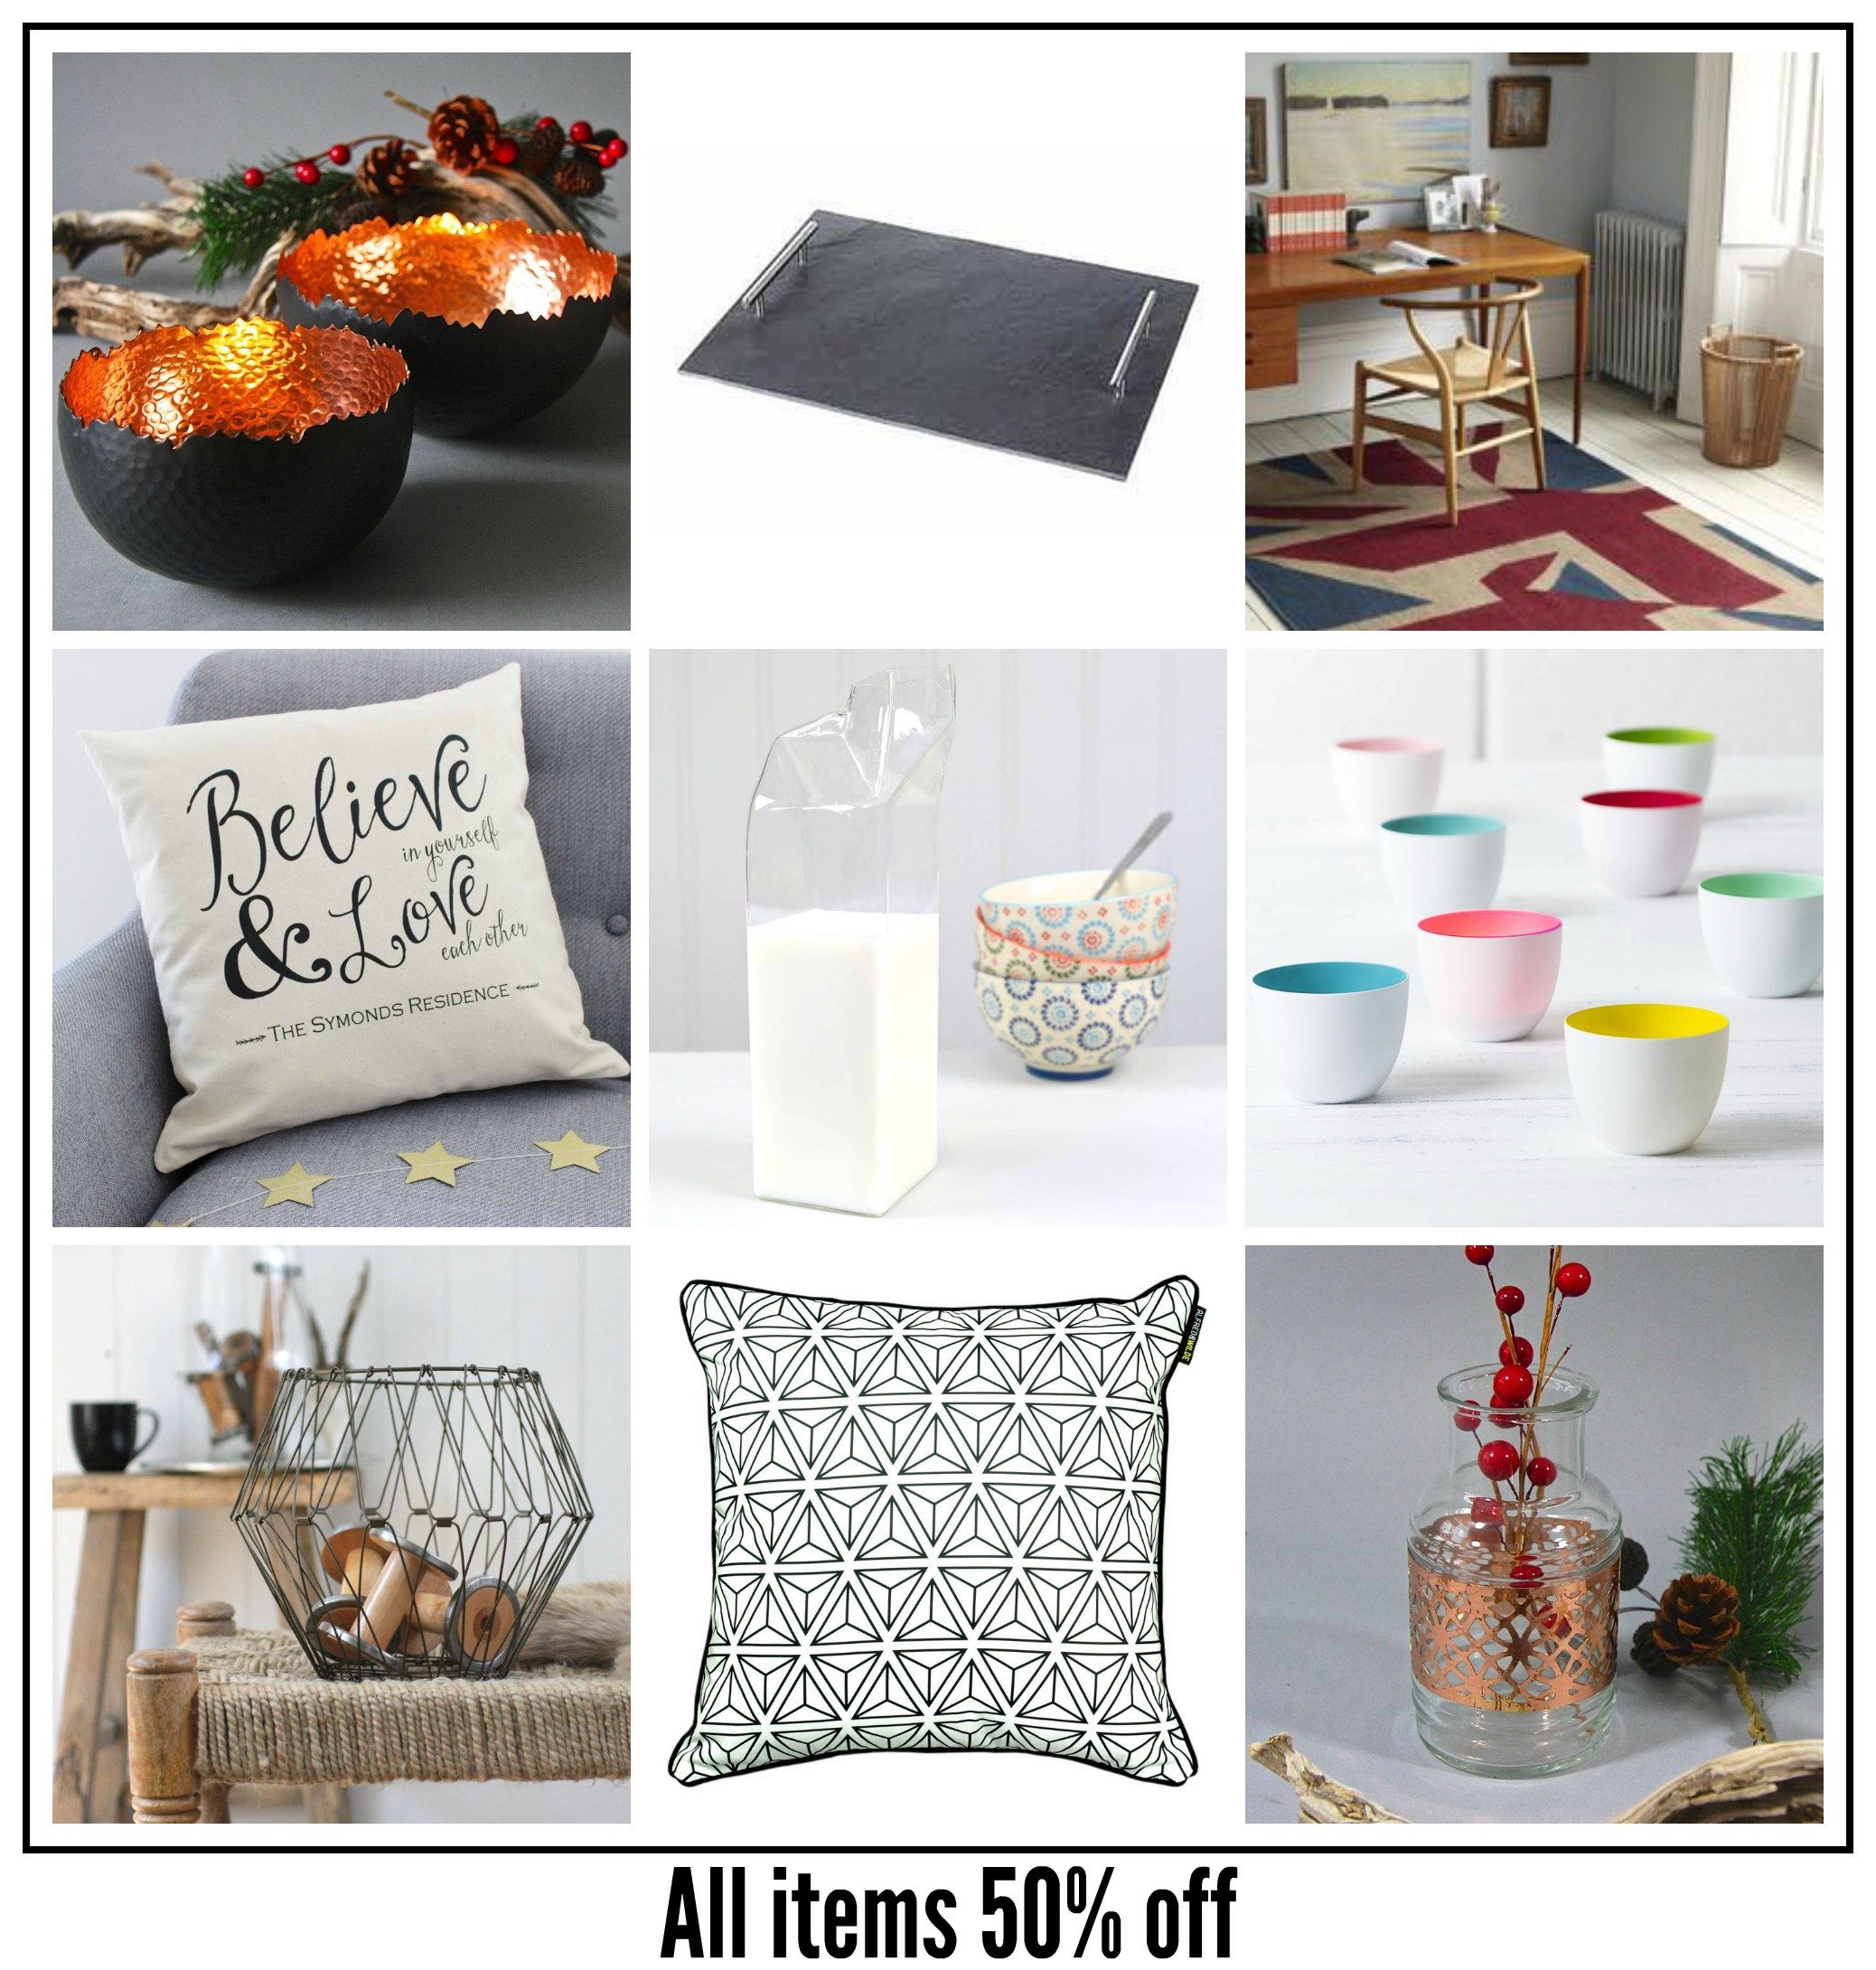 Fresh home design blog home design and style for Fresh design blog